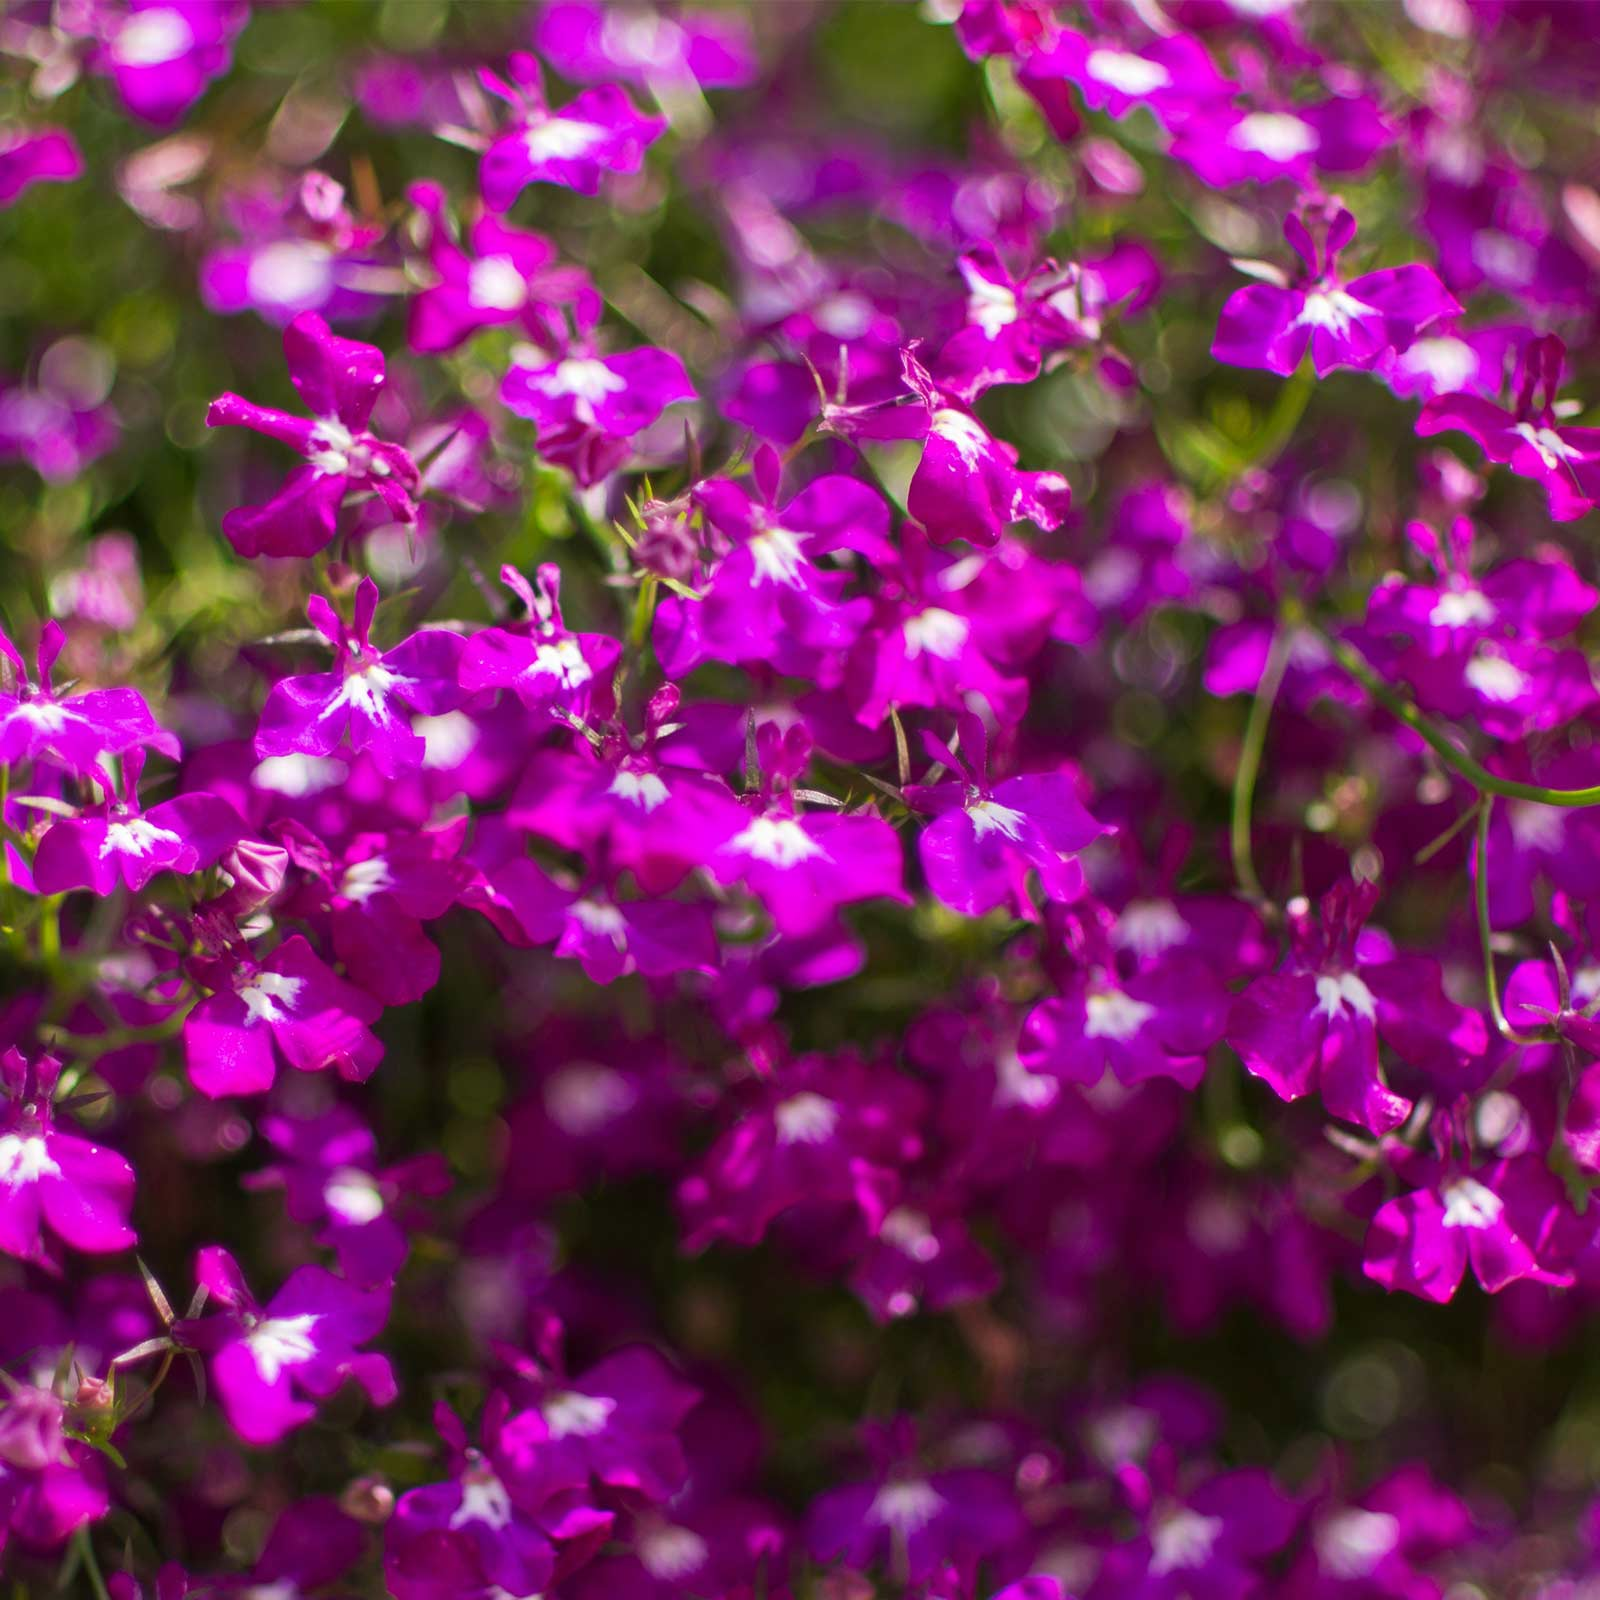 Lobelia Flower Garden Seeds - Regatta Series, Lilac - 1000 Seeds - Trailing, Annual Flower Gardening Seed - Lobelia erinus